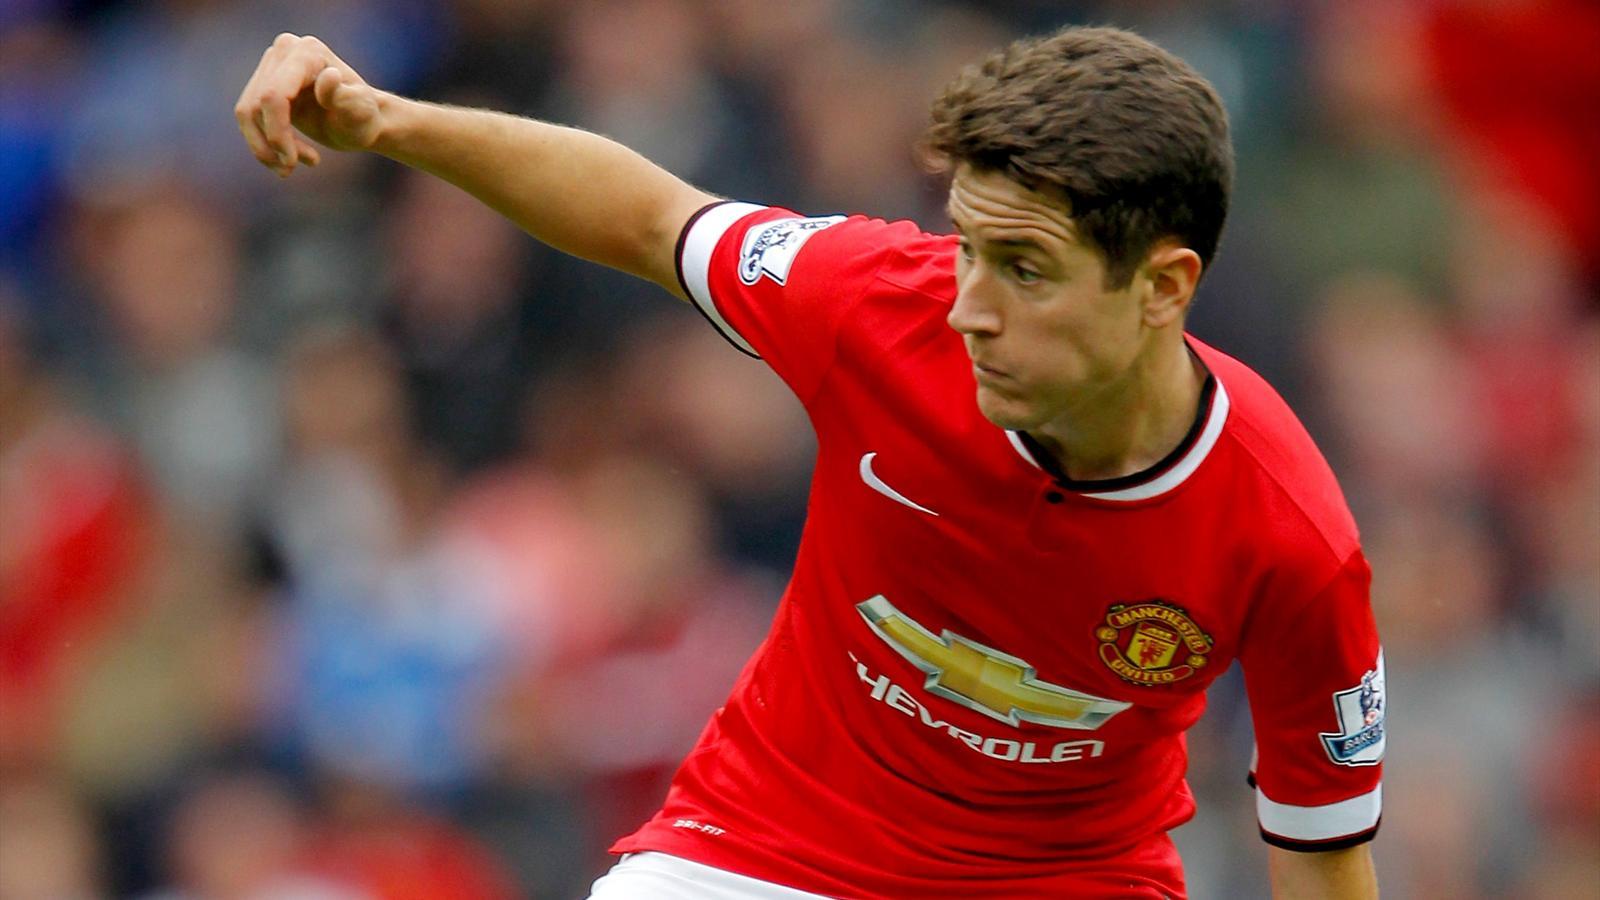 Manchester United U0026 39 S Ander Herrera Named In Spanish Match